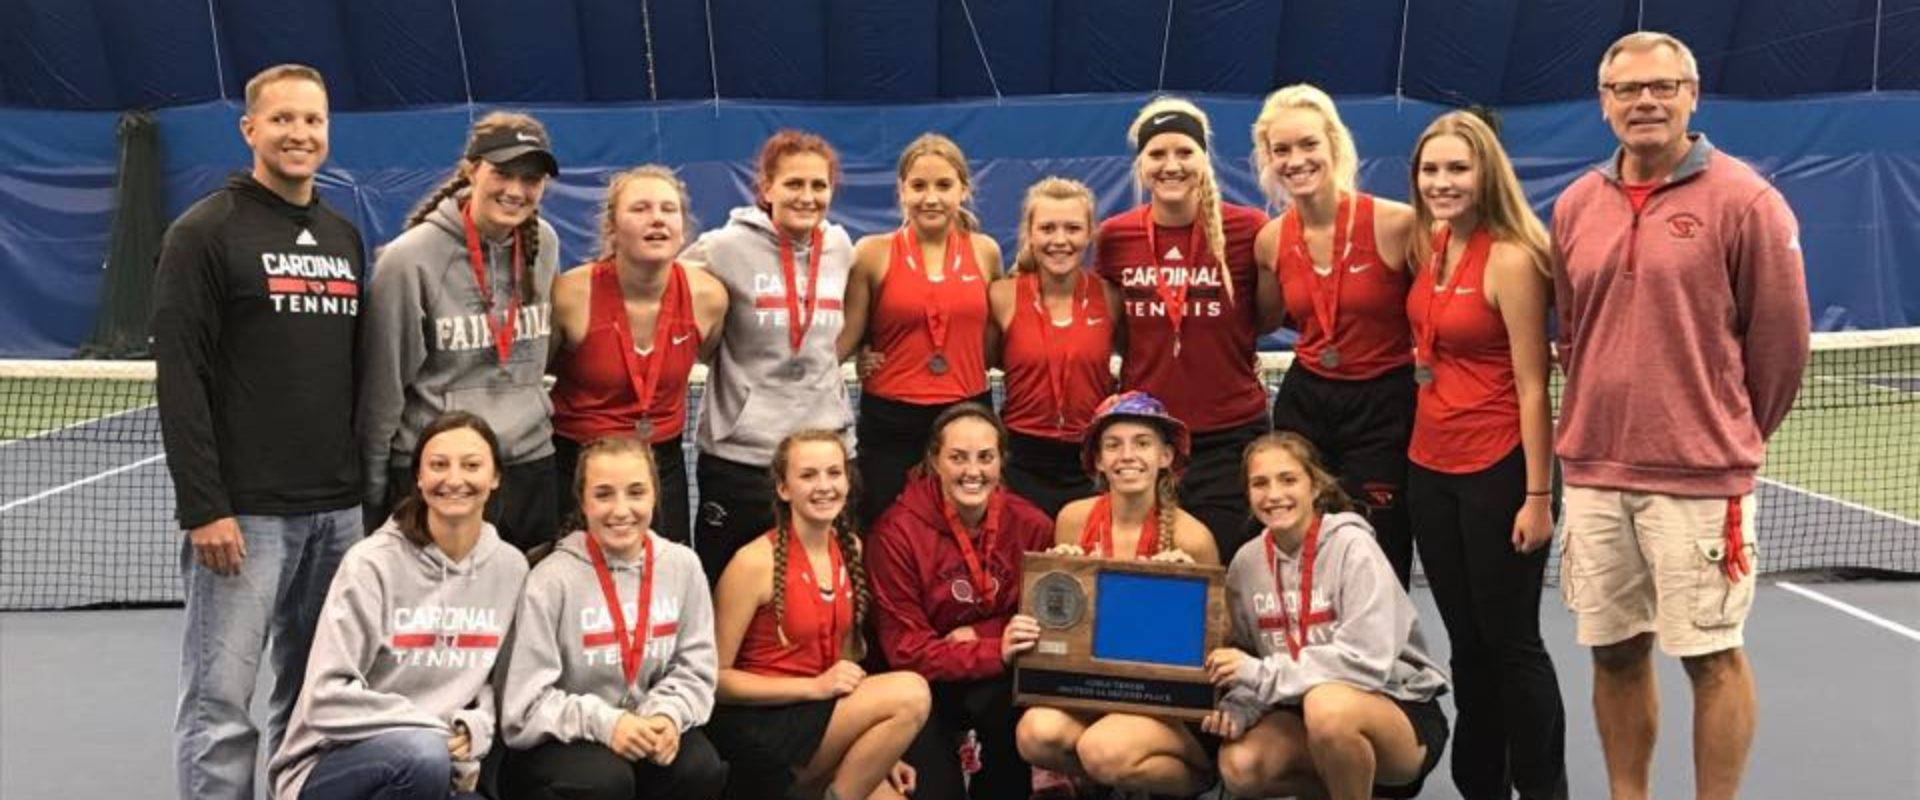 Cardinal Athletic Foundation